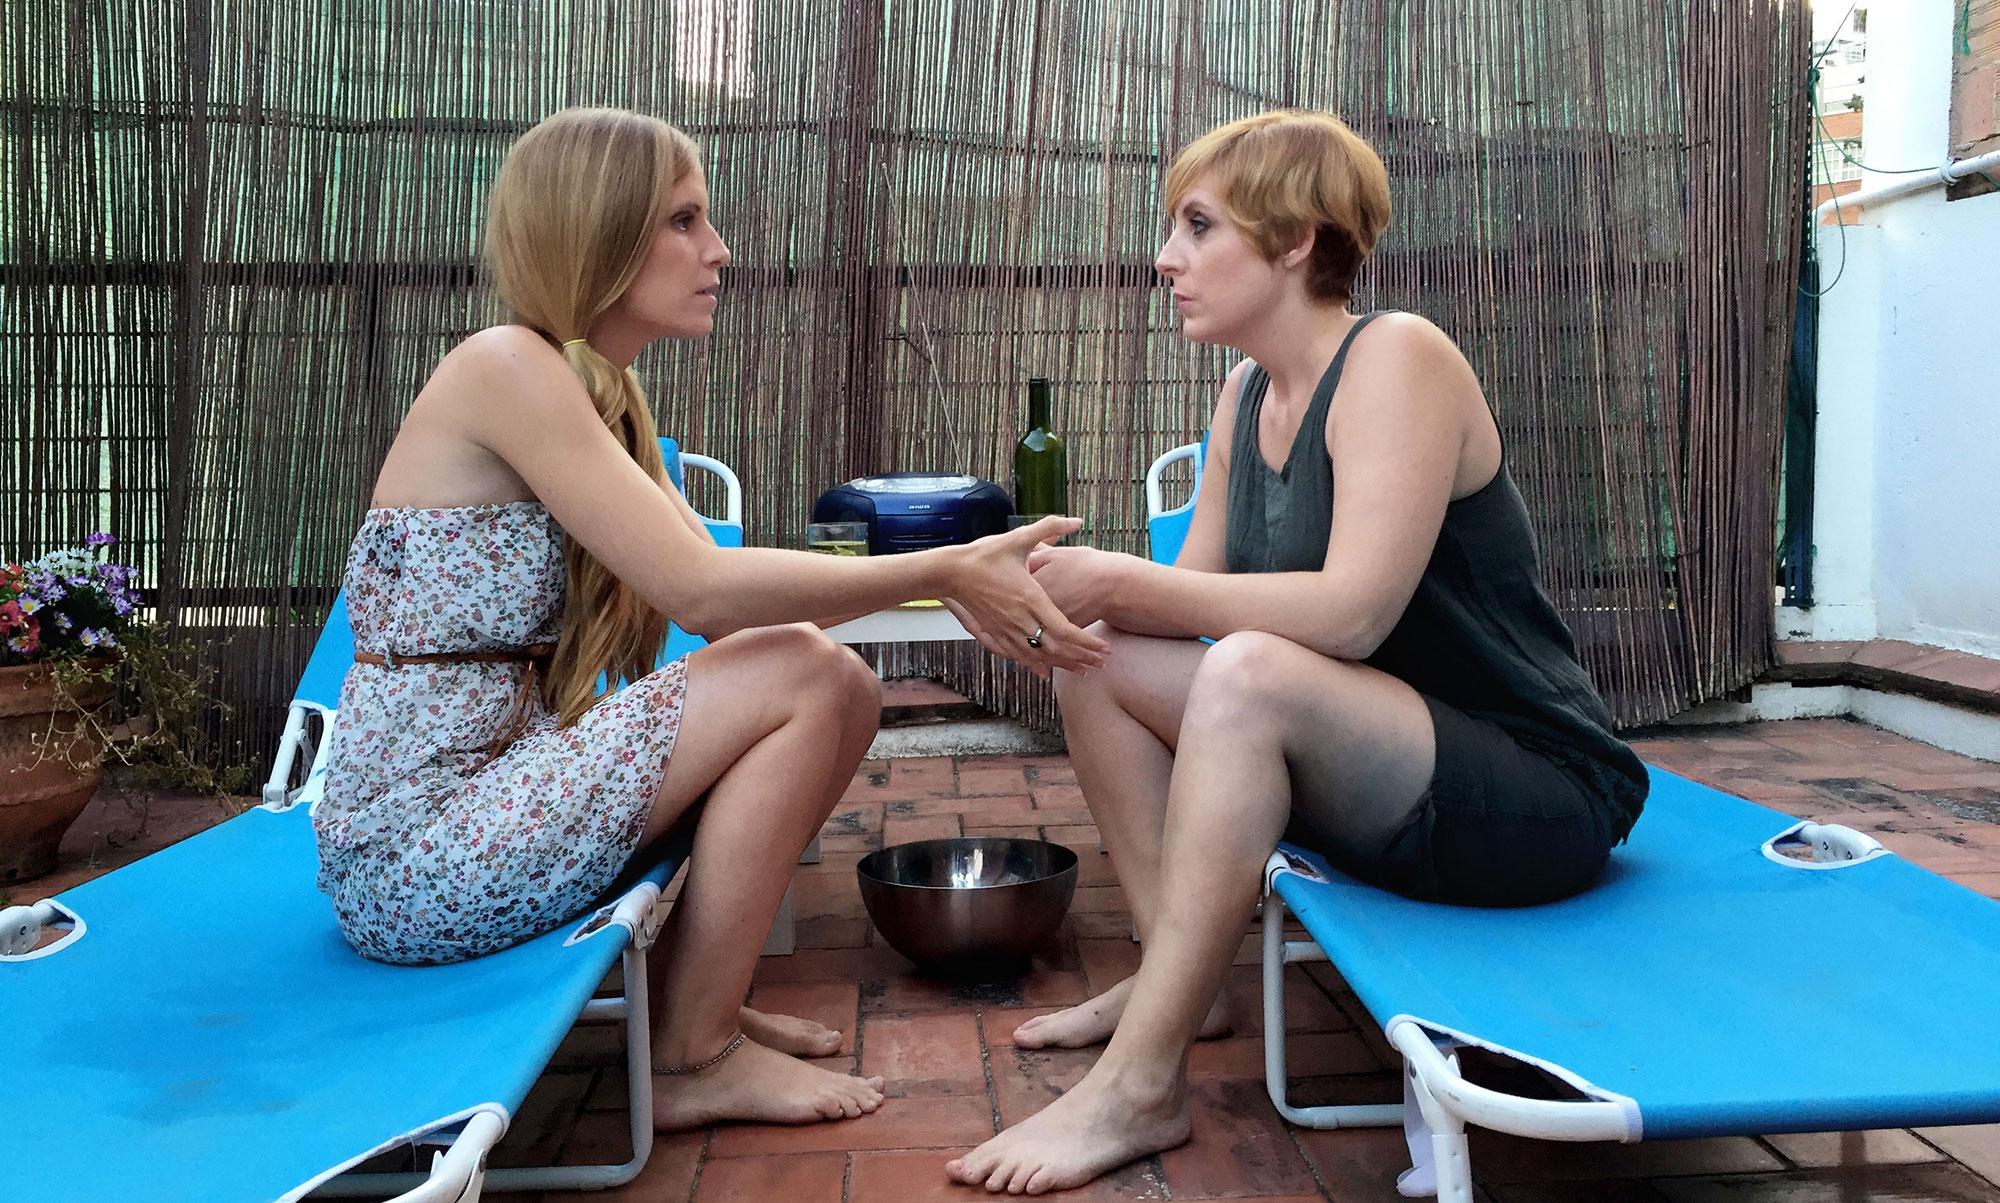 Humans Laura Estévez (Mònica) y Lara Vacas (Ariadna)